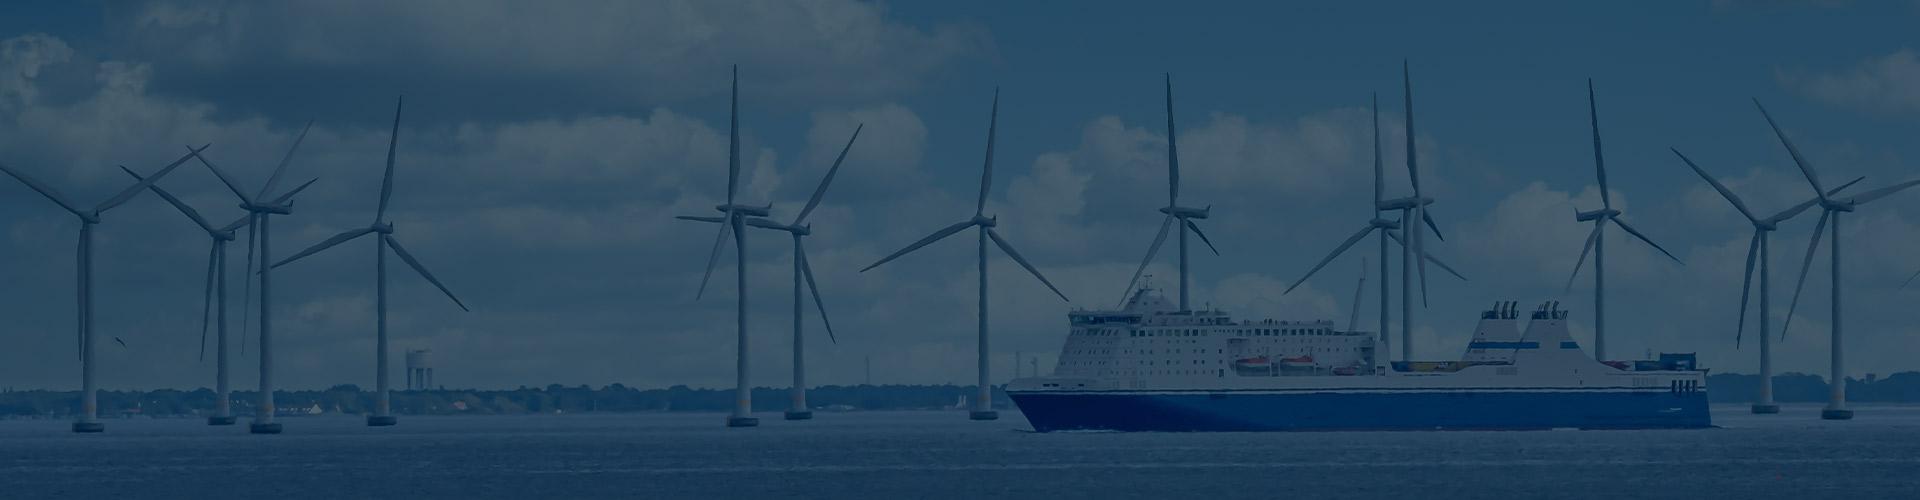 Blue ship passing windturbines at sea